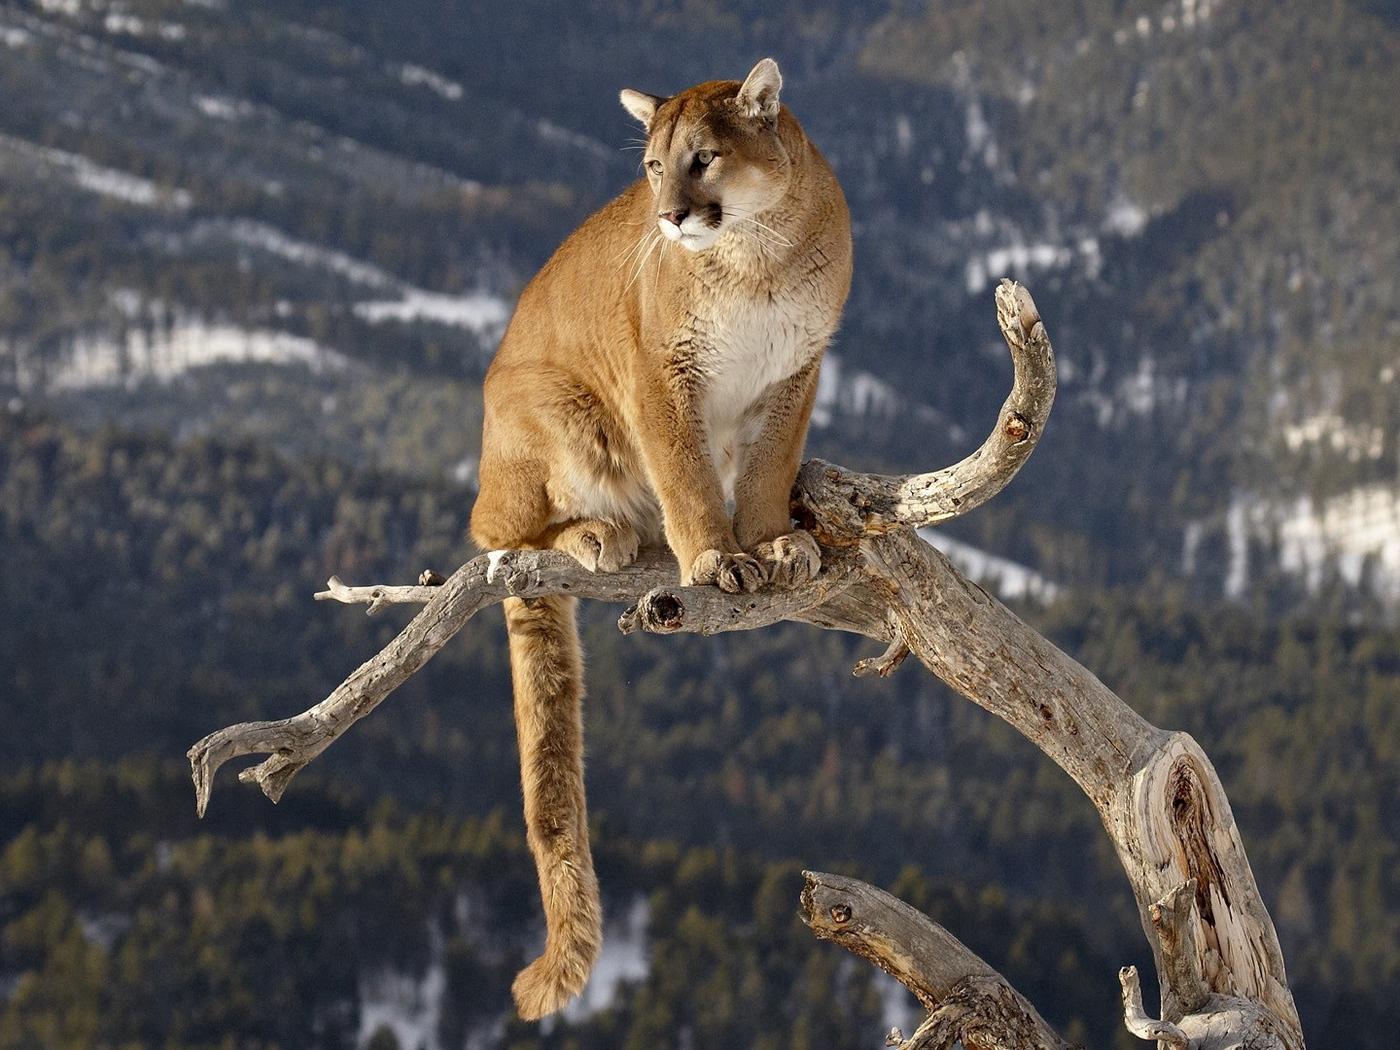 Wallpaper Puma, Branches, Mountains, Grass, Sitting, - Mountain Lion , HD Wallpaper & Backgrounds